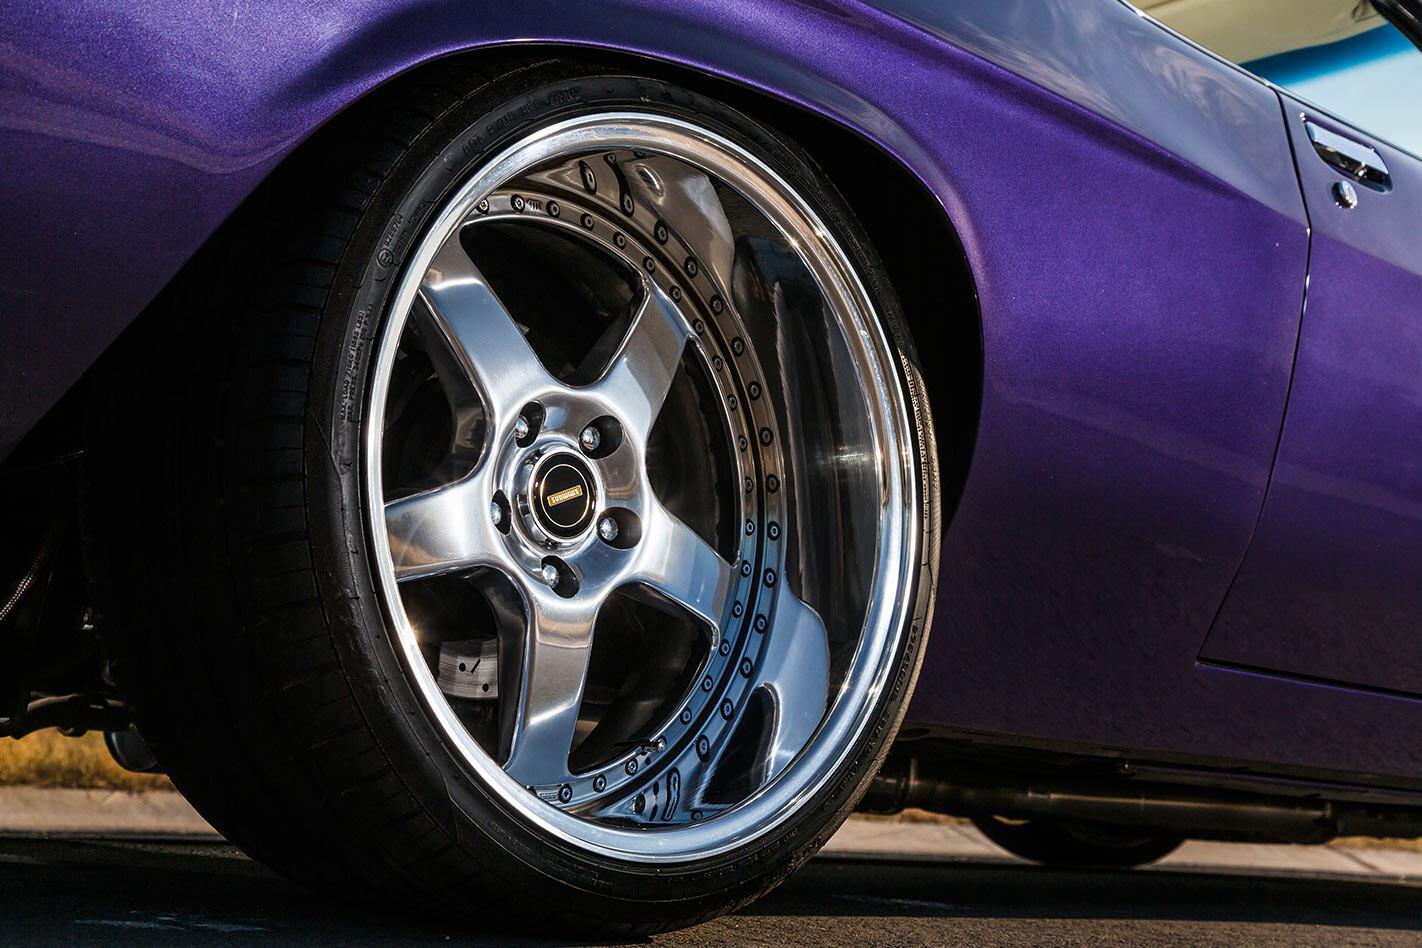 Holden HQ Monaro wheel